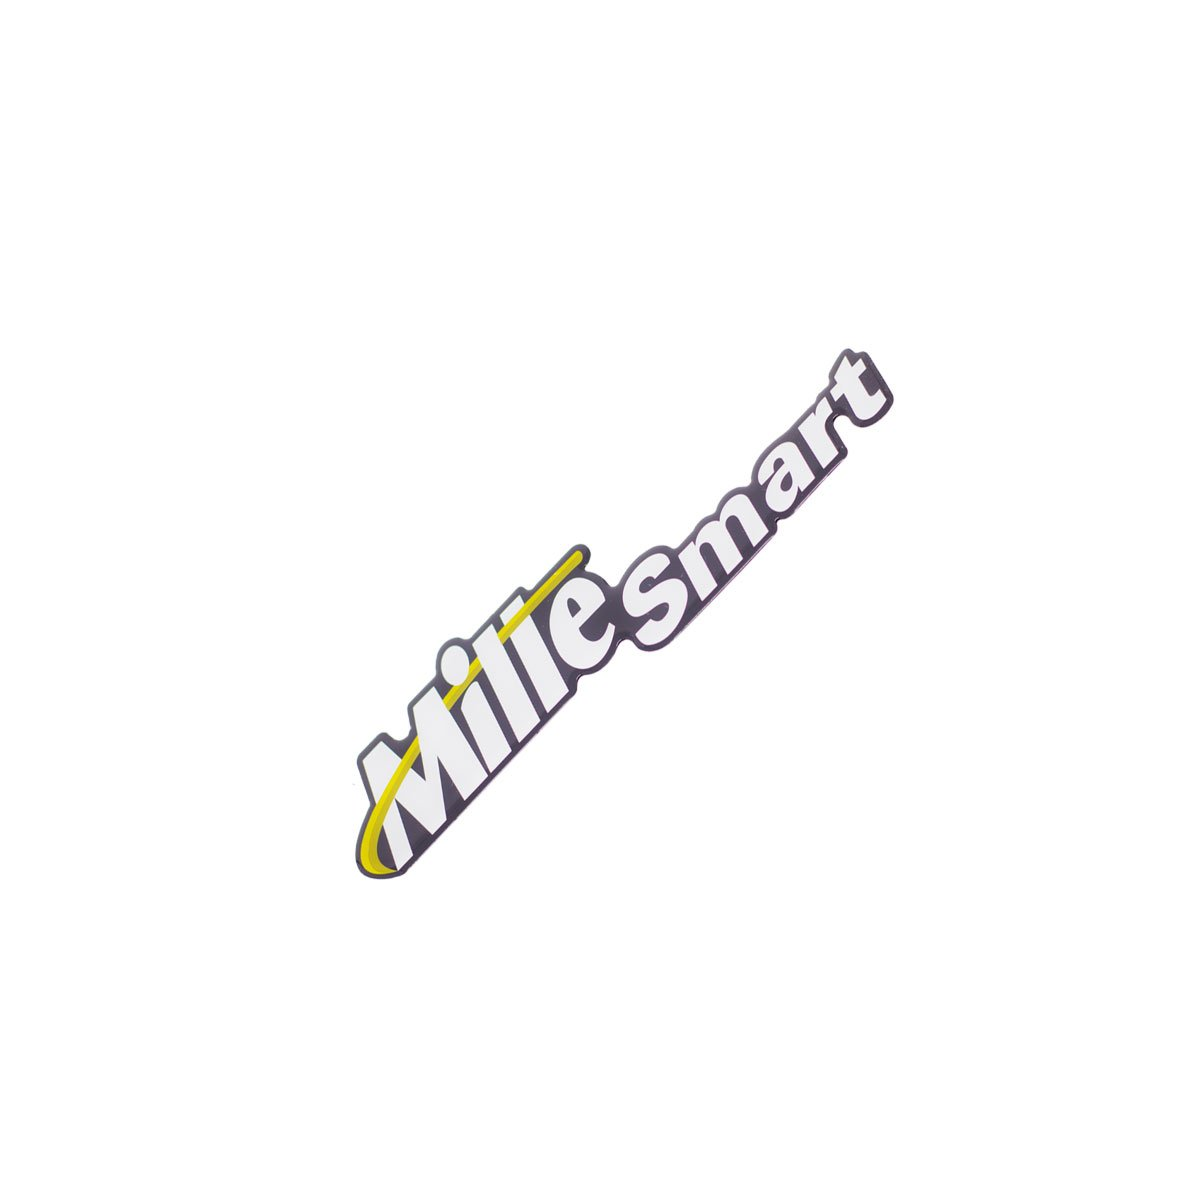 Emblema Mille Smart Resinado